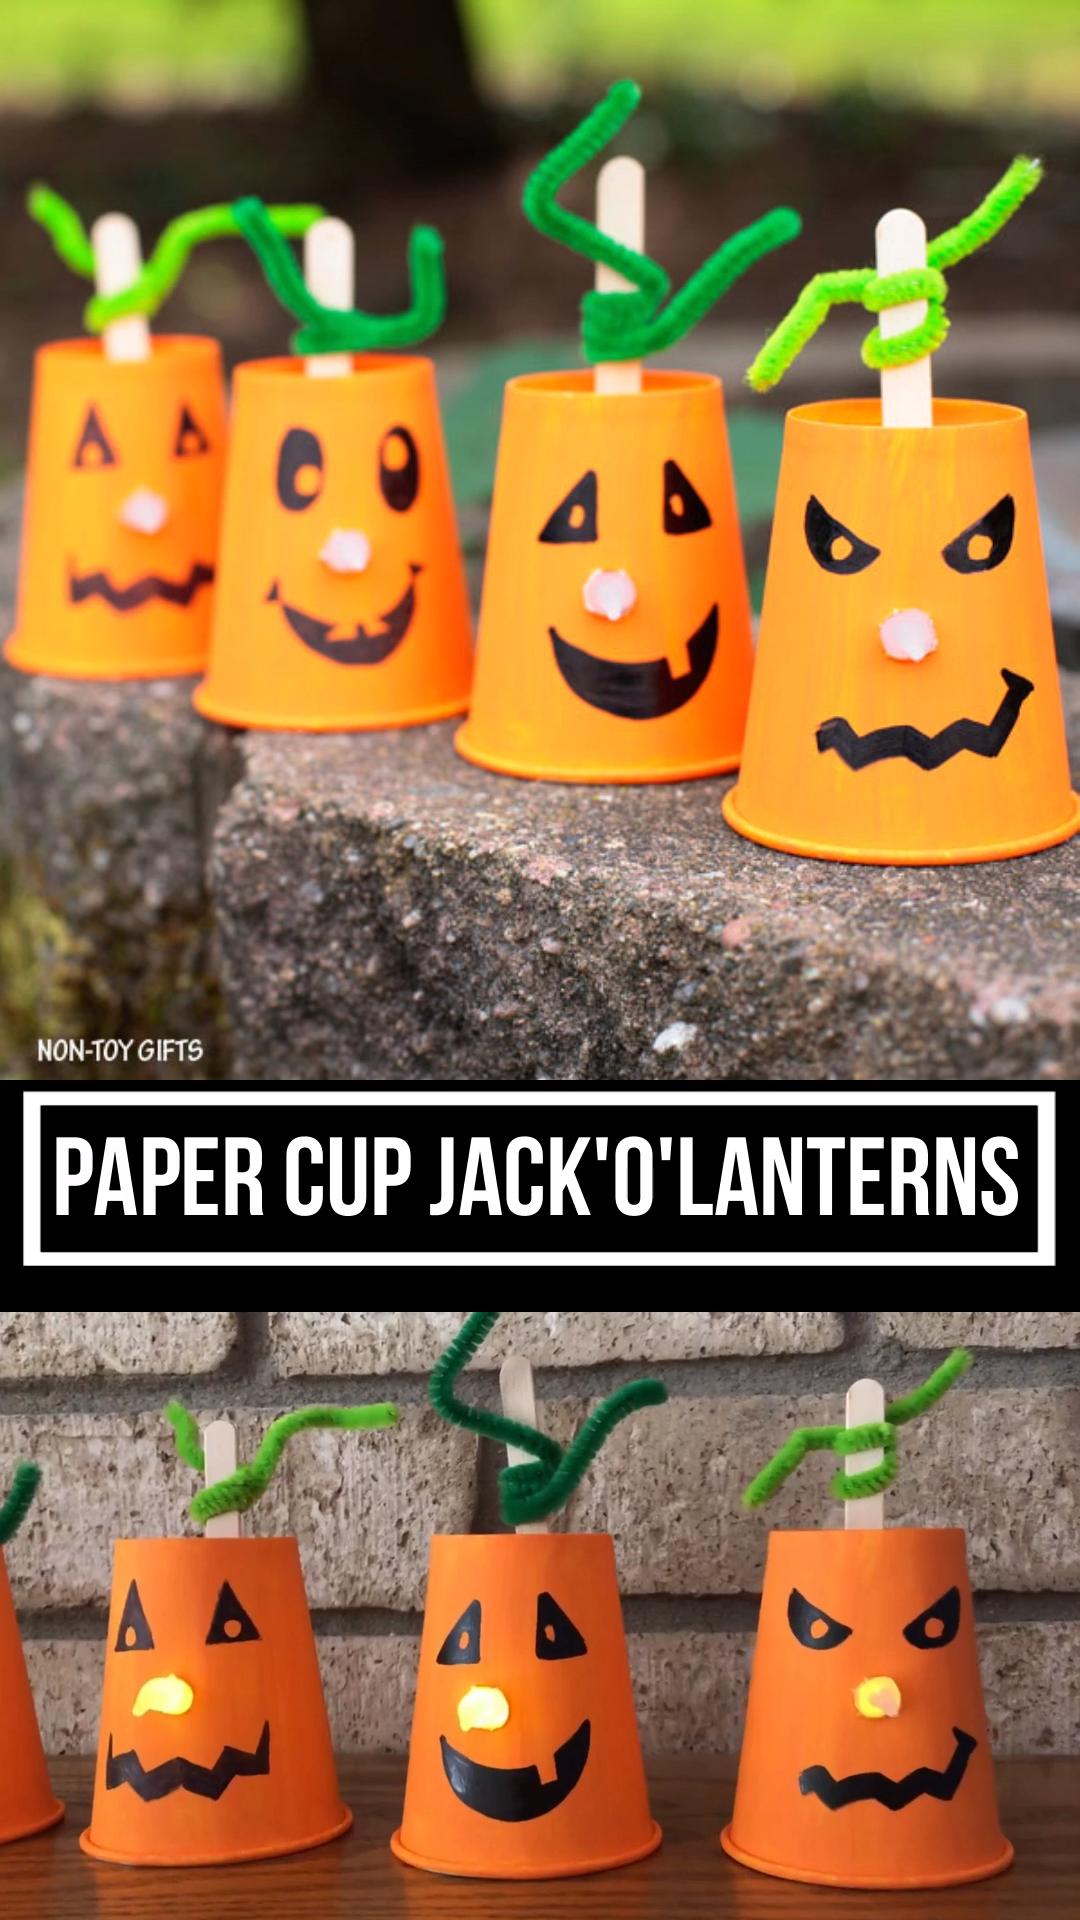 Paper cup Jack'O'Lantern